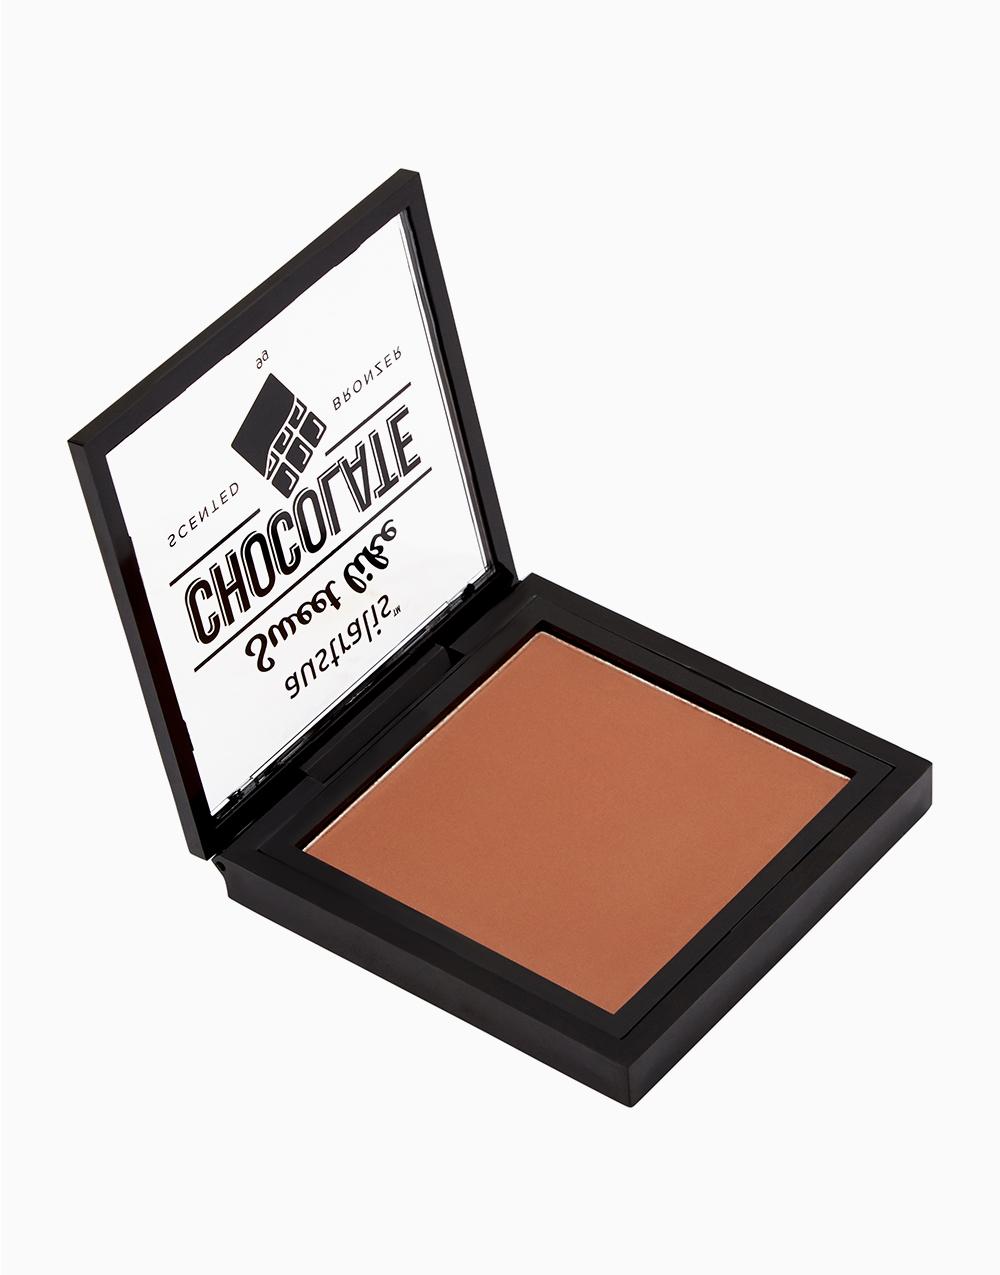 Sweet Like Chocolate Bronzer by Australis | Semi-Sweet Sun